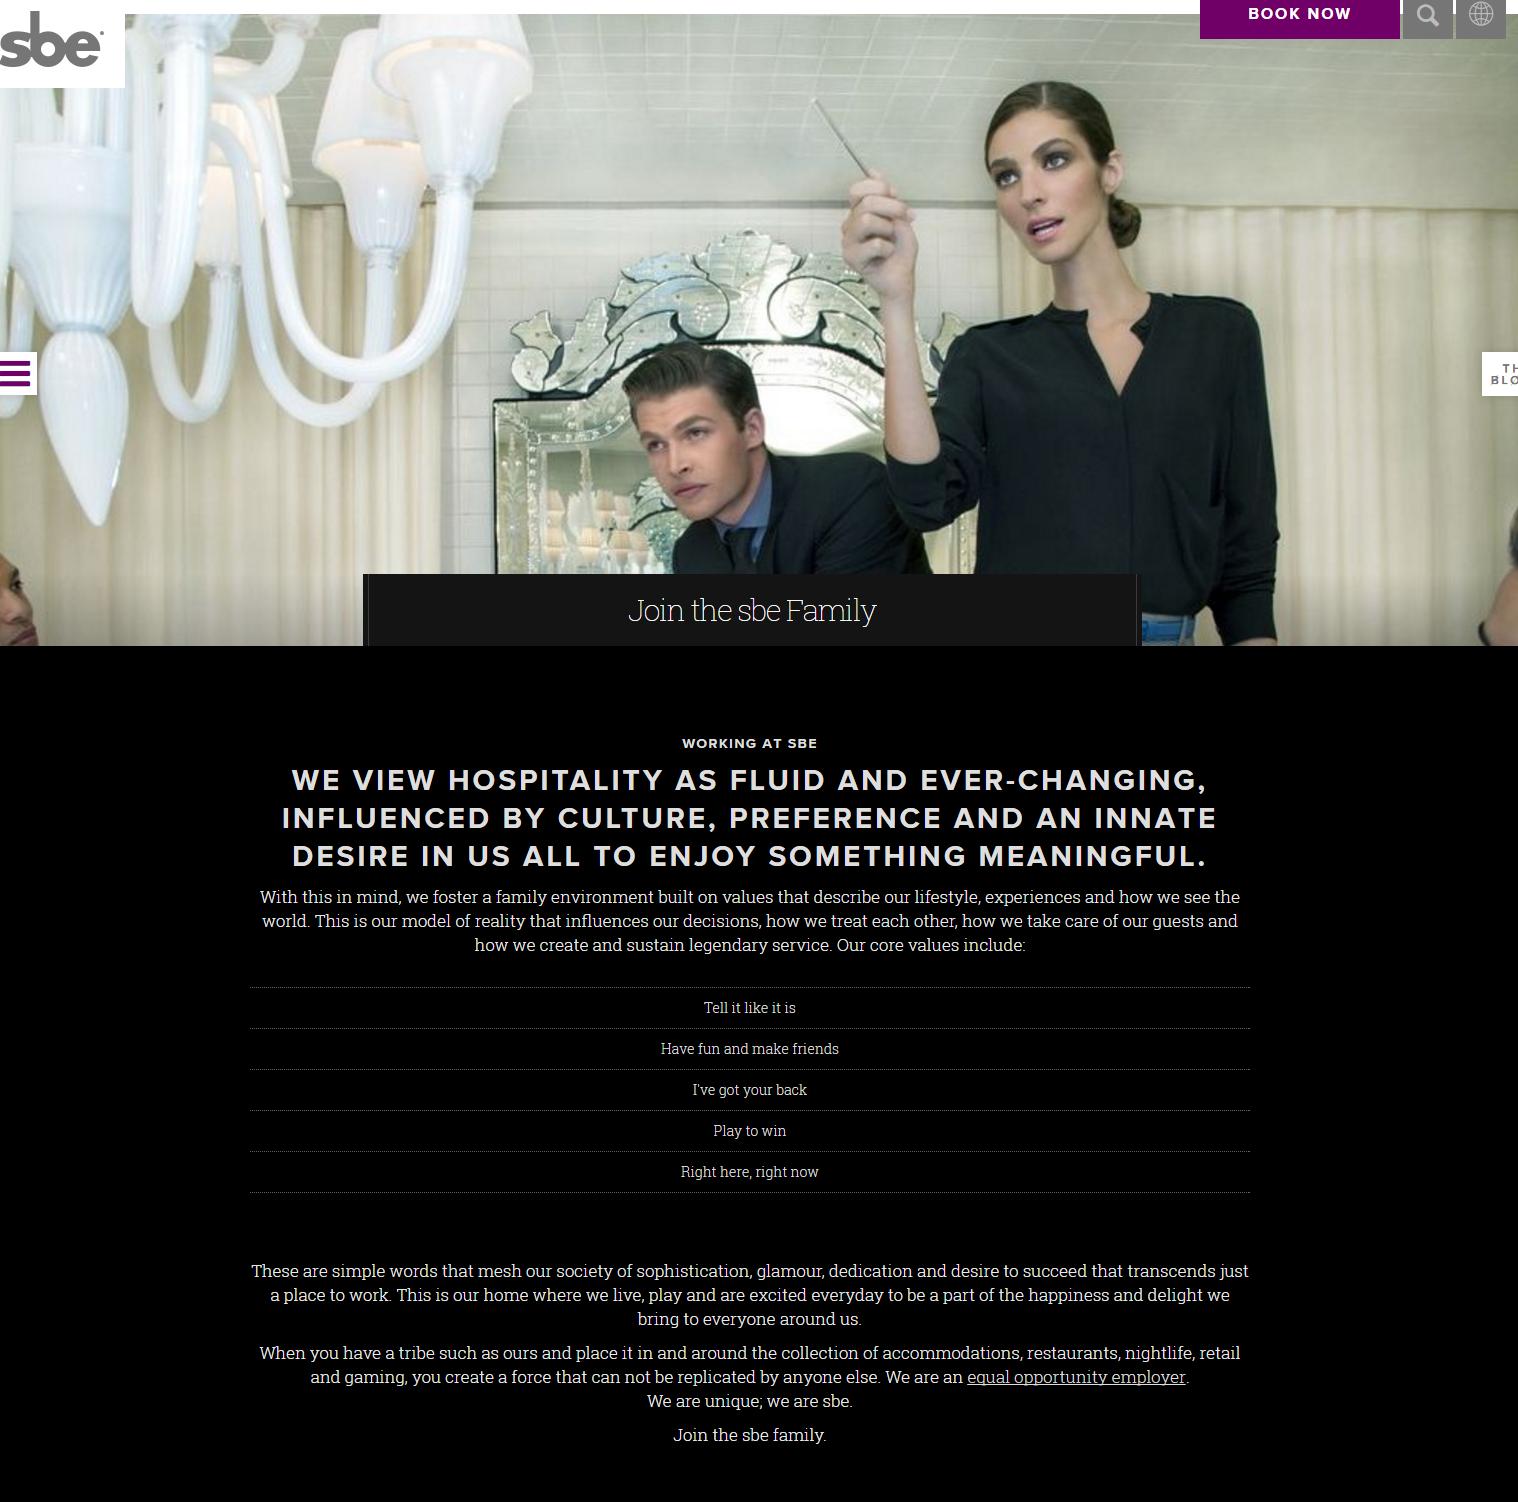 SBE Company Career Site